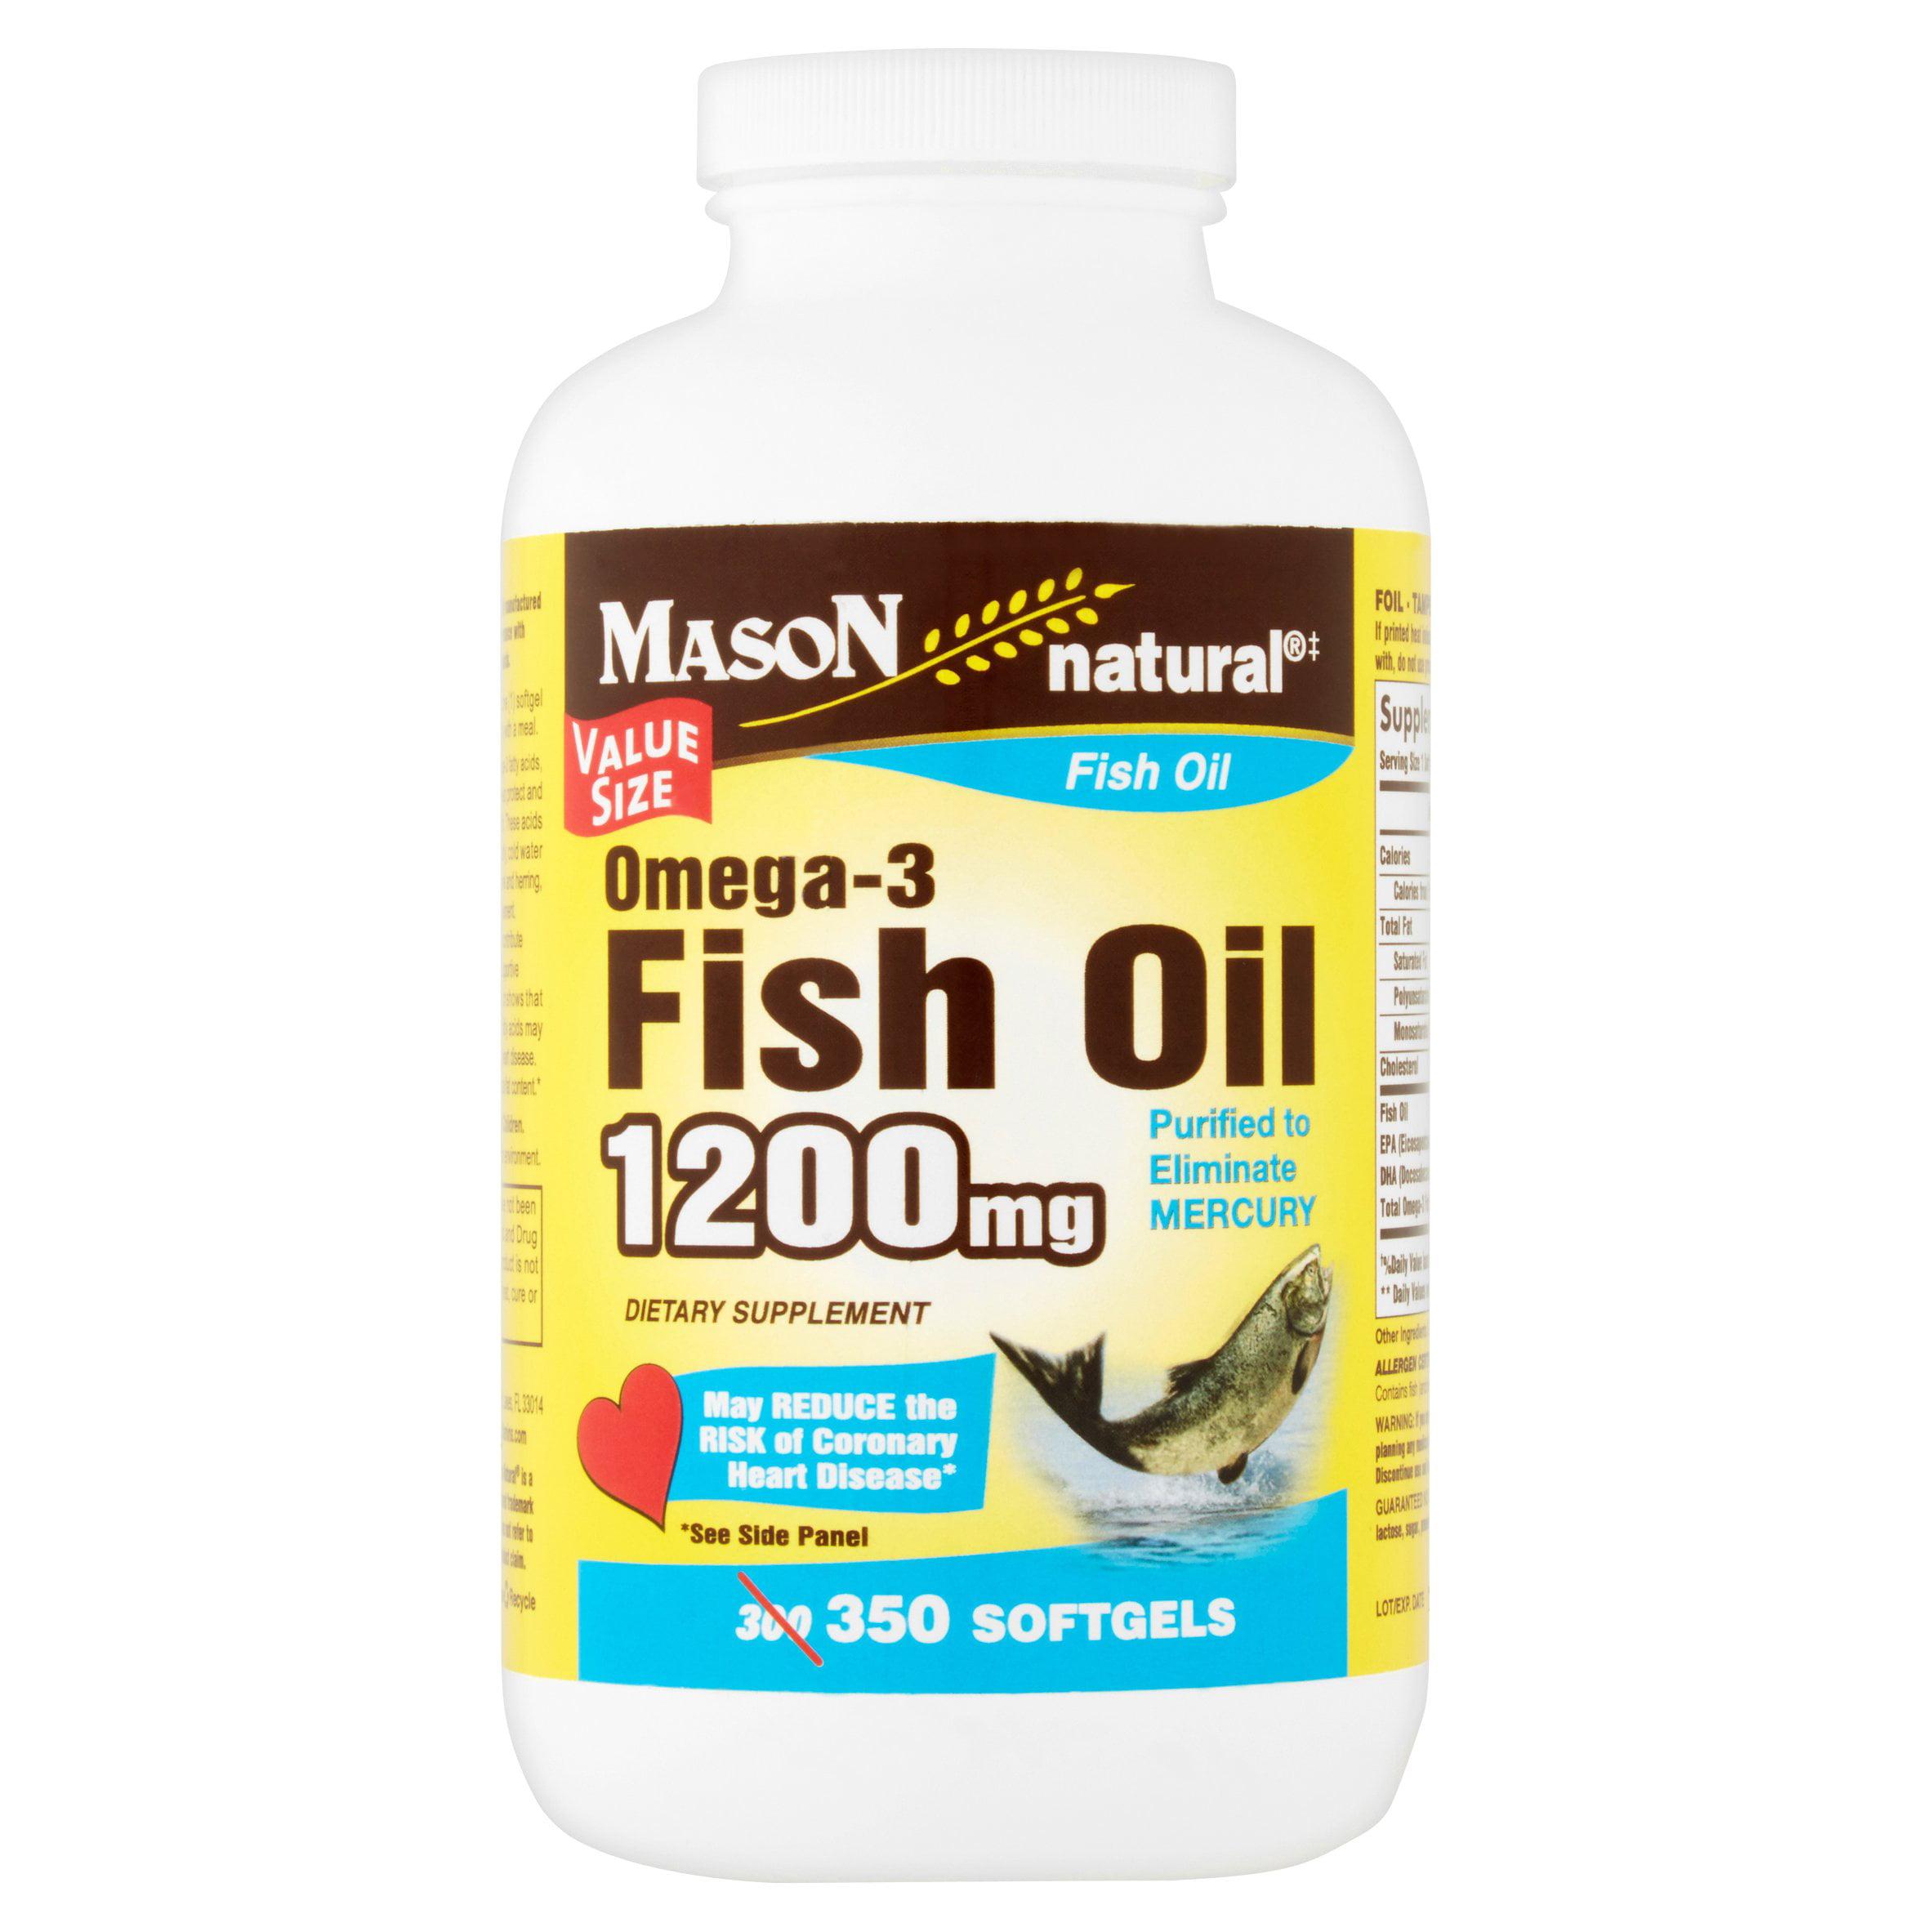 Mason Natural Omega-3 Fish Oil Softgels Value Size, 1200mg, 350 count